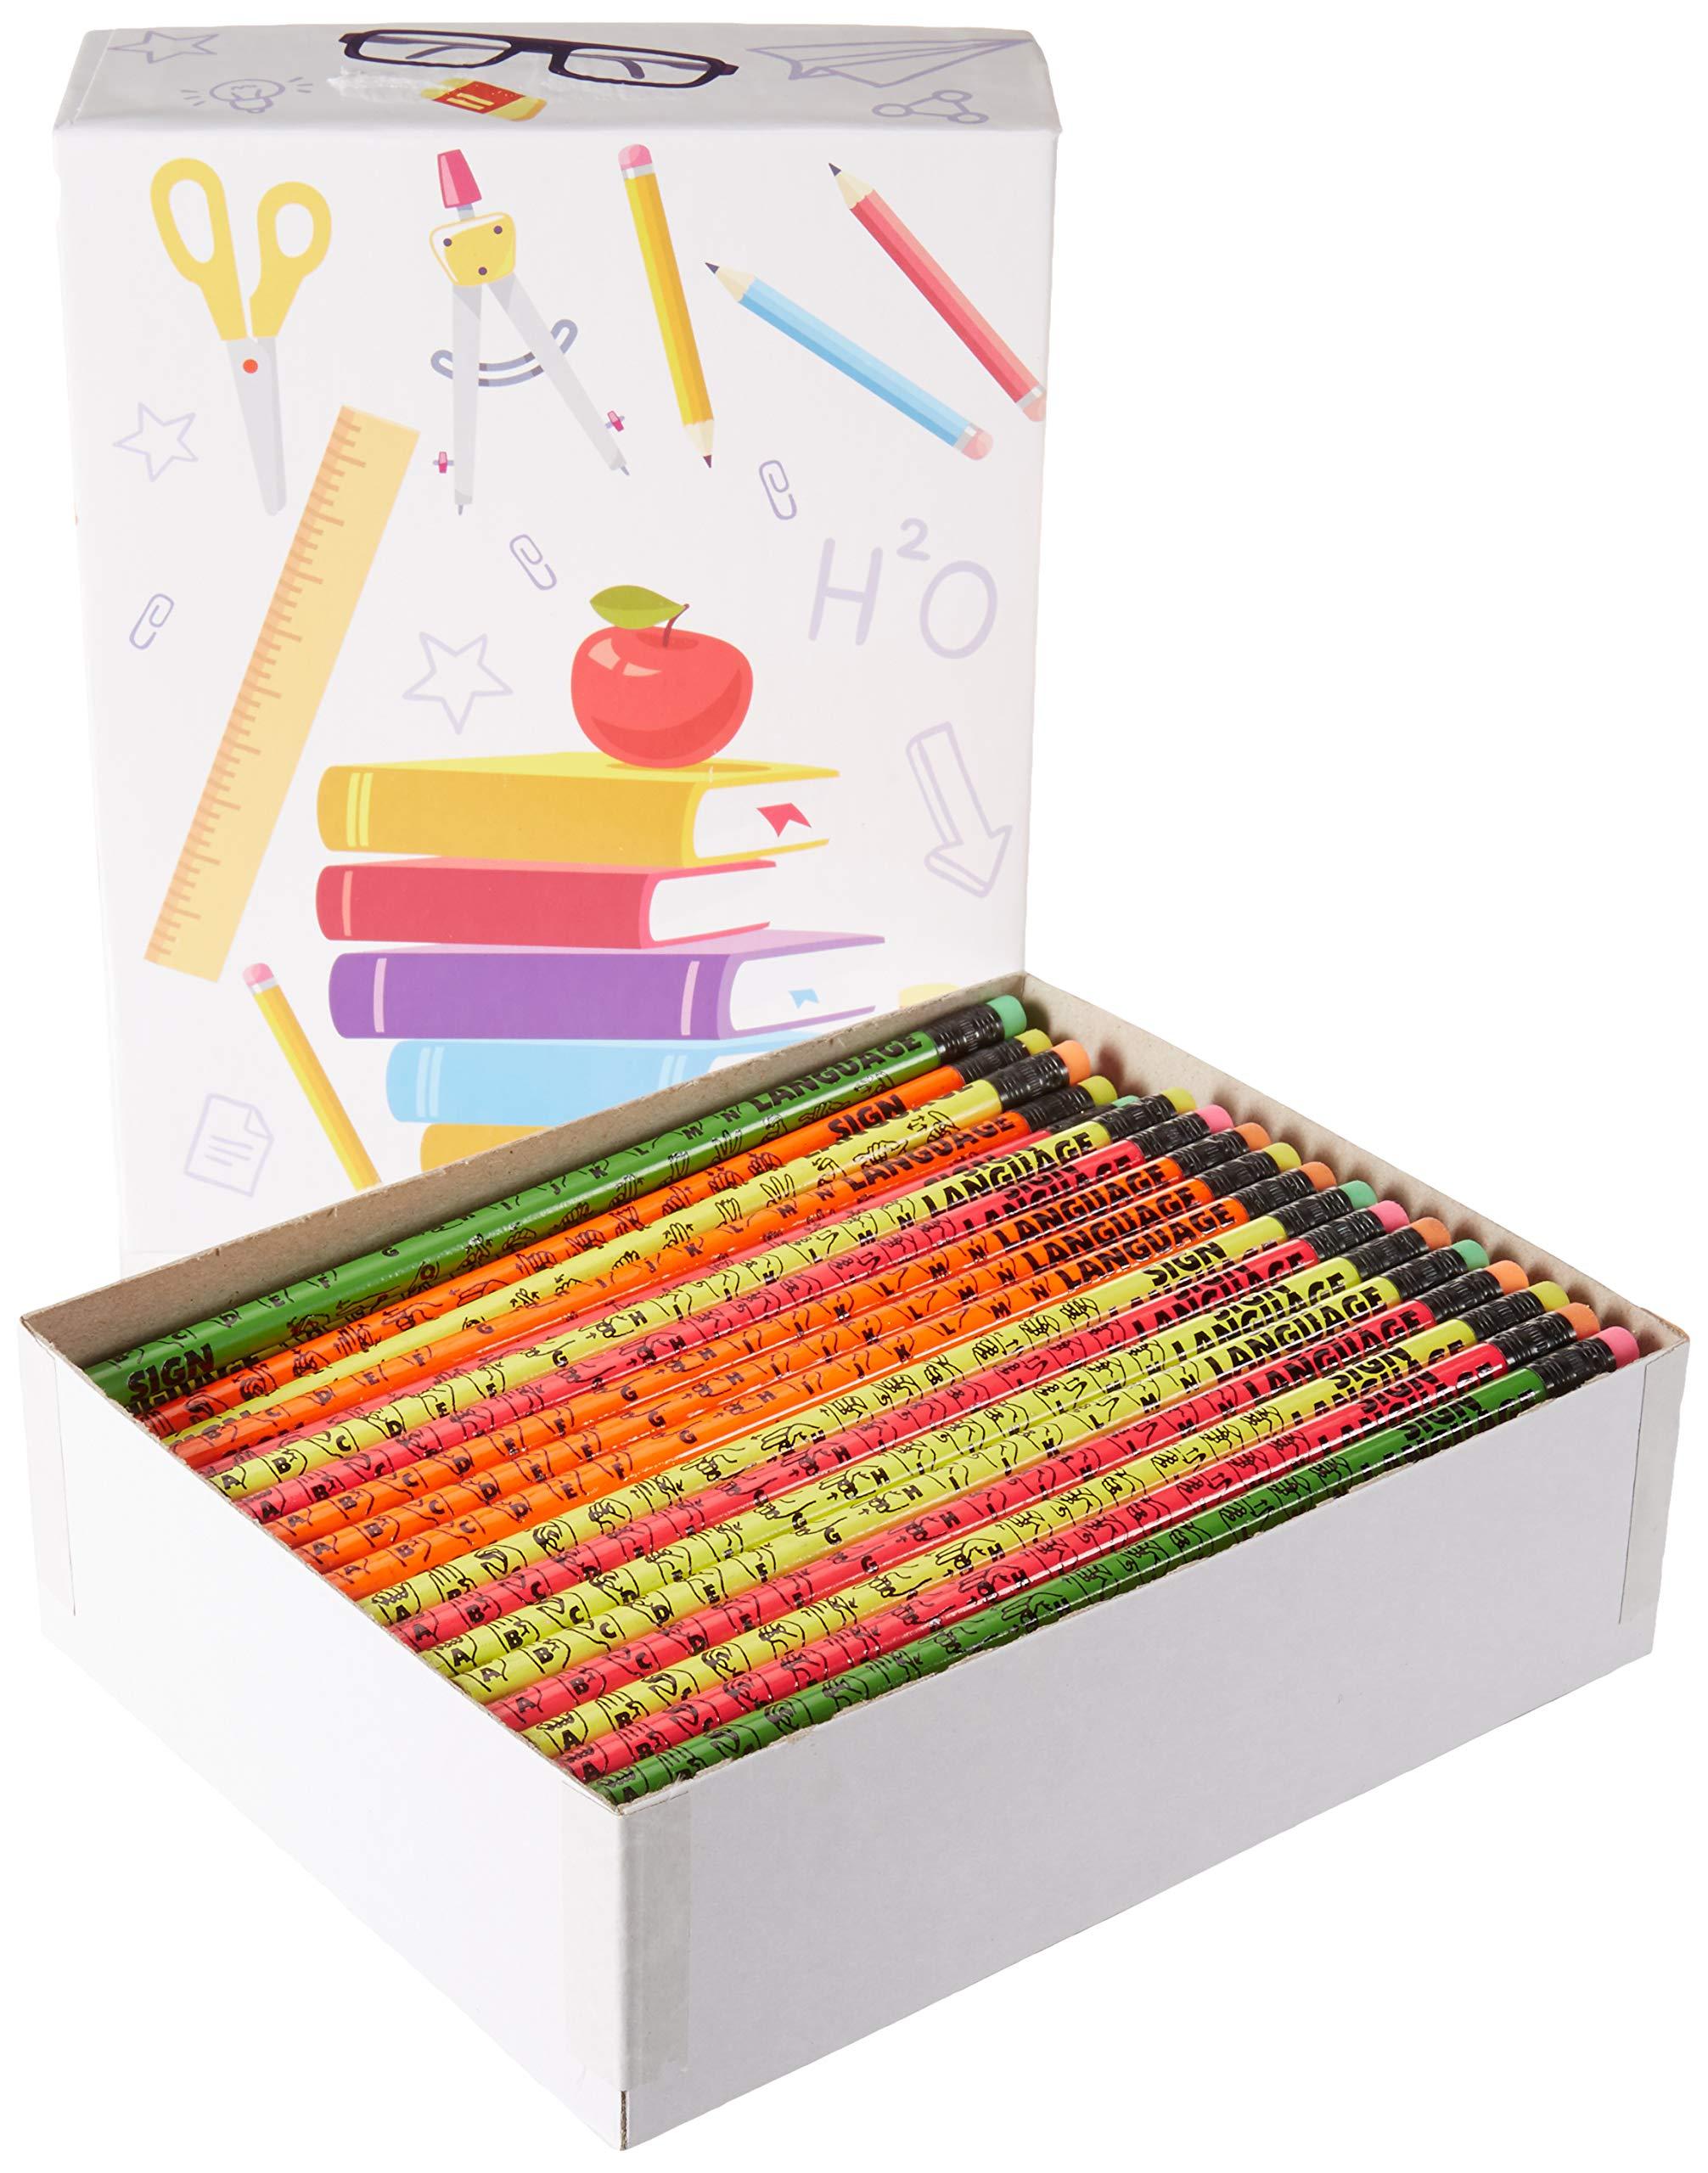 Sign Language Pencils (144 Pencils)